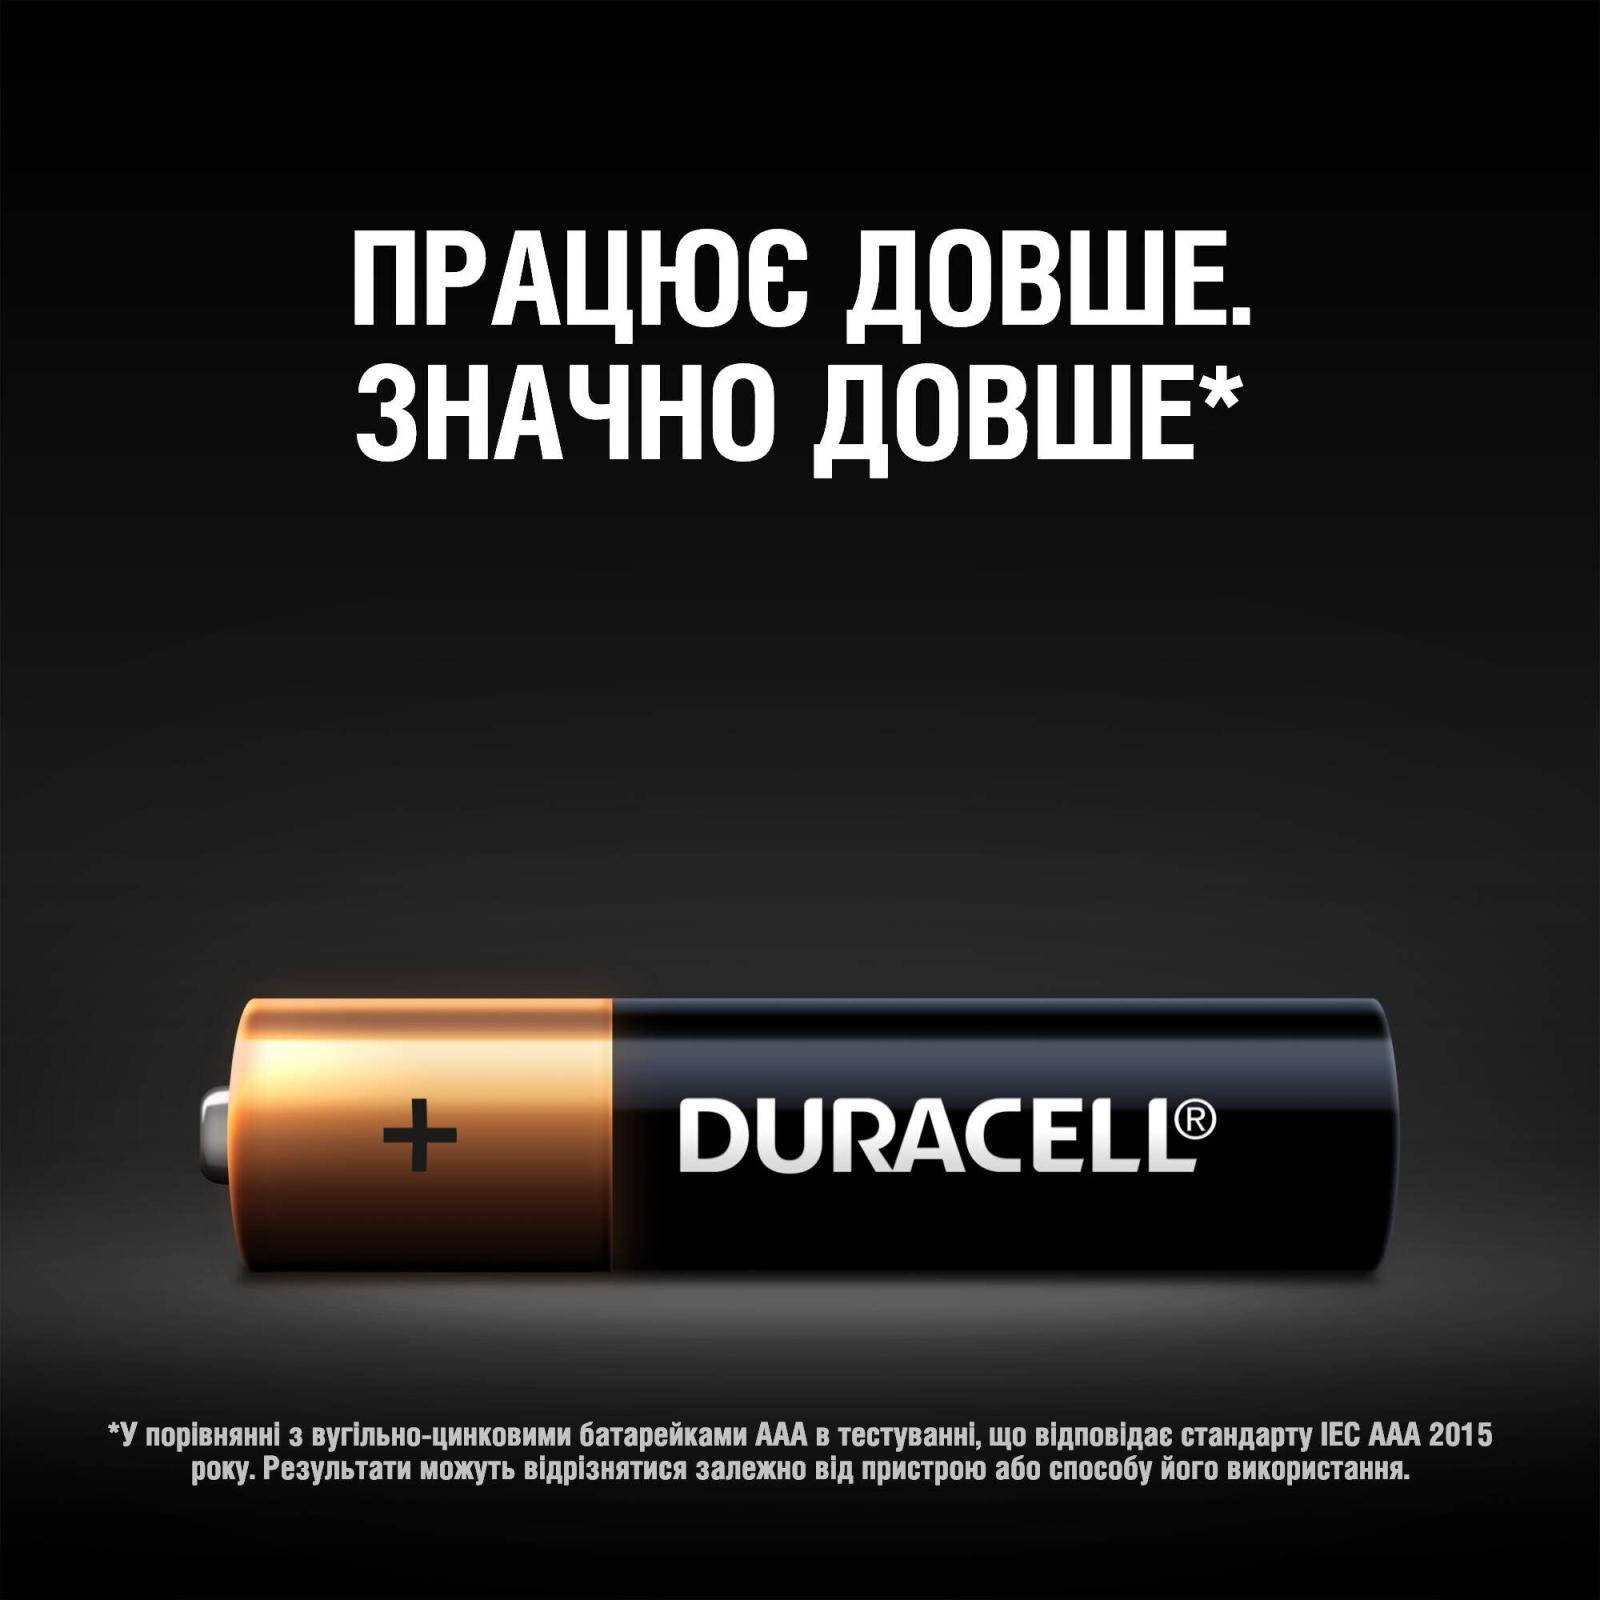 Батарейка Duracell AAA MN2400 LR03 * 12 (5000394109254 / 81545432) изображение 4